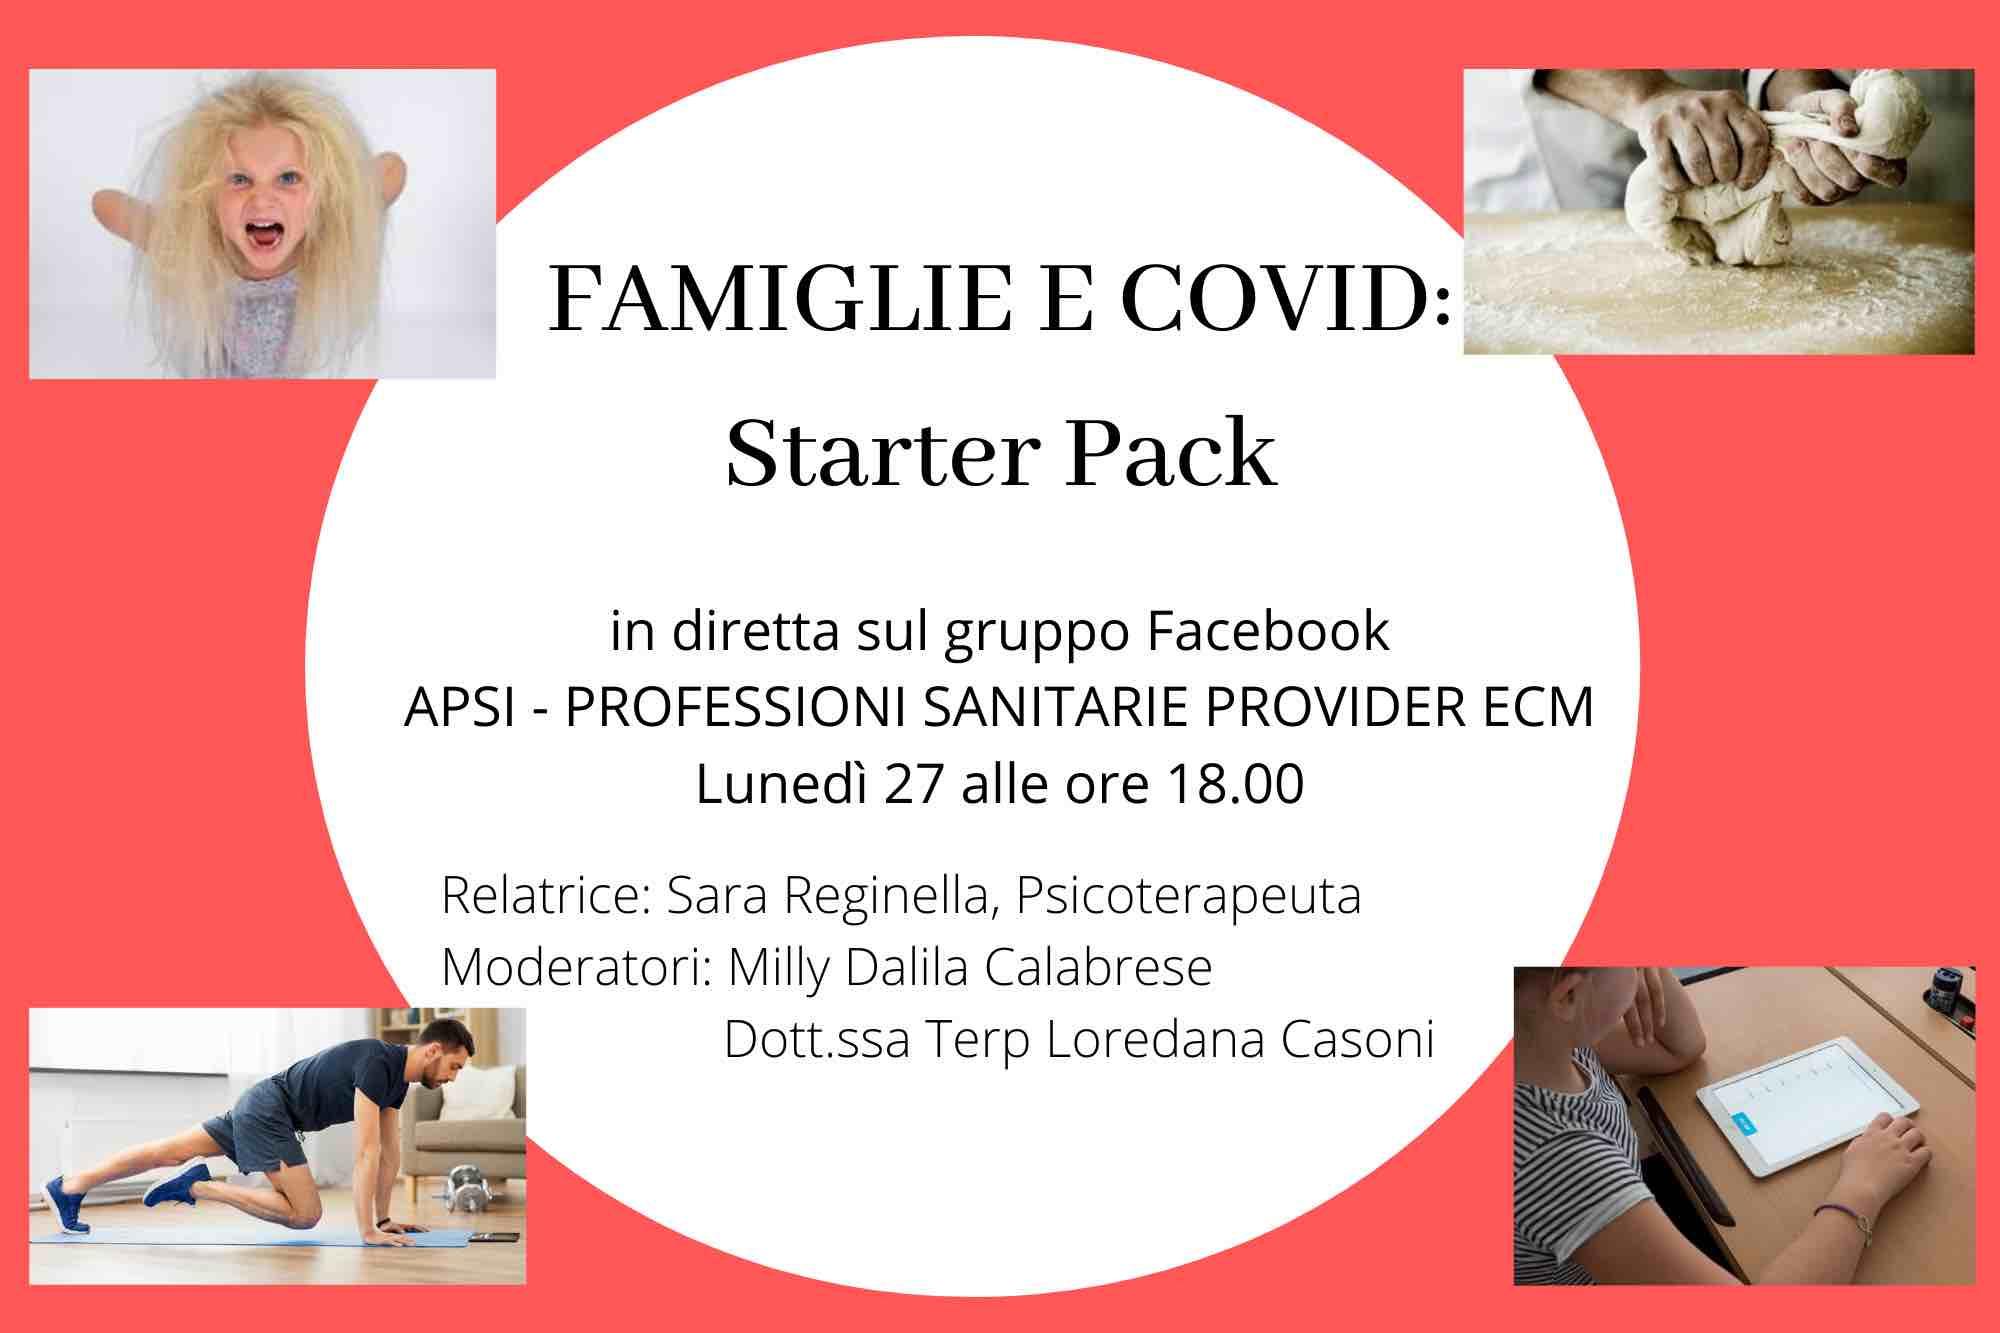 Famiglie e covid: starter pack